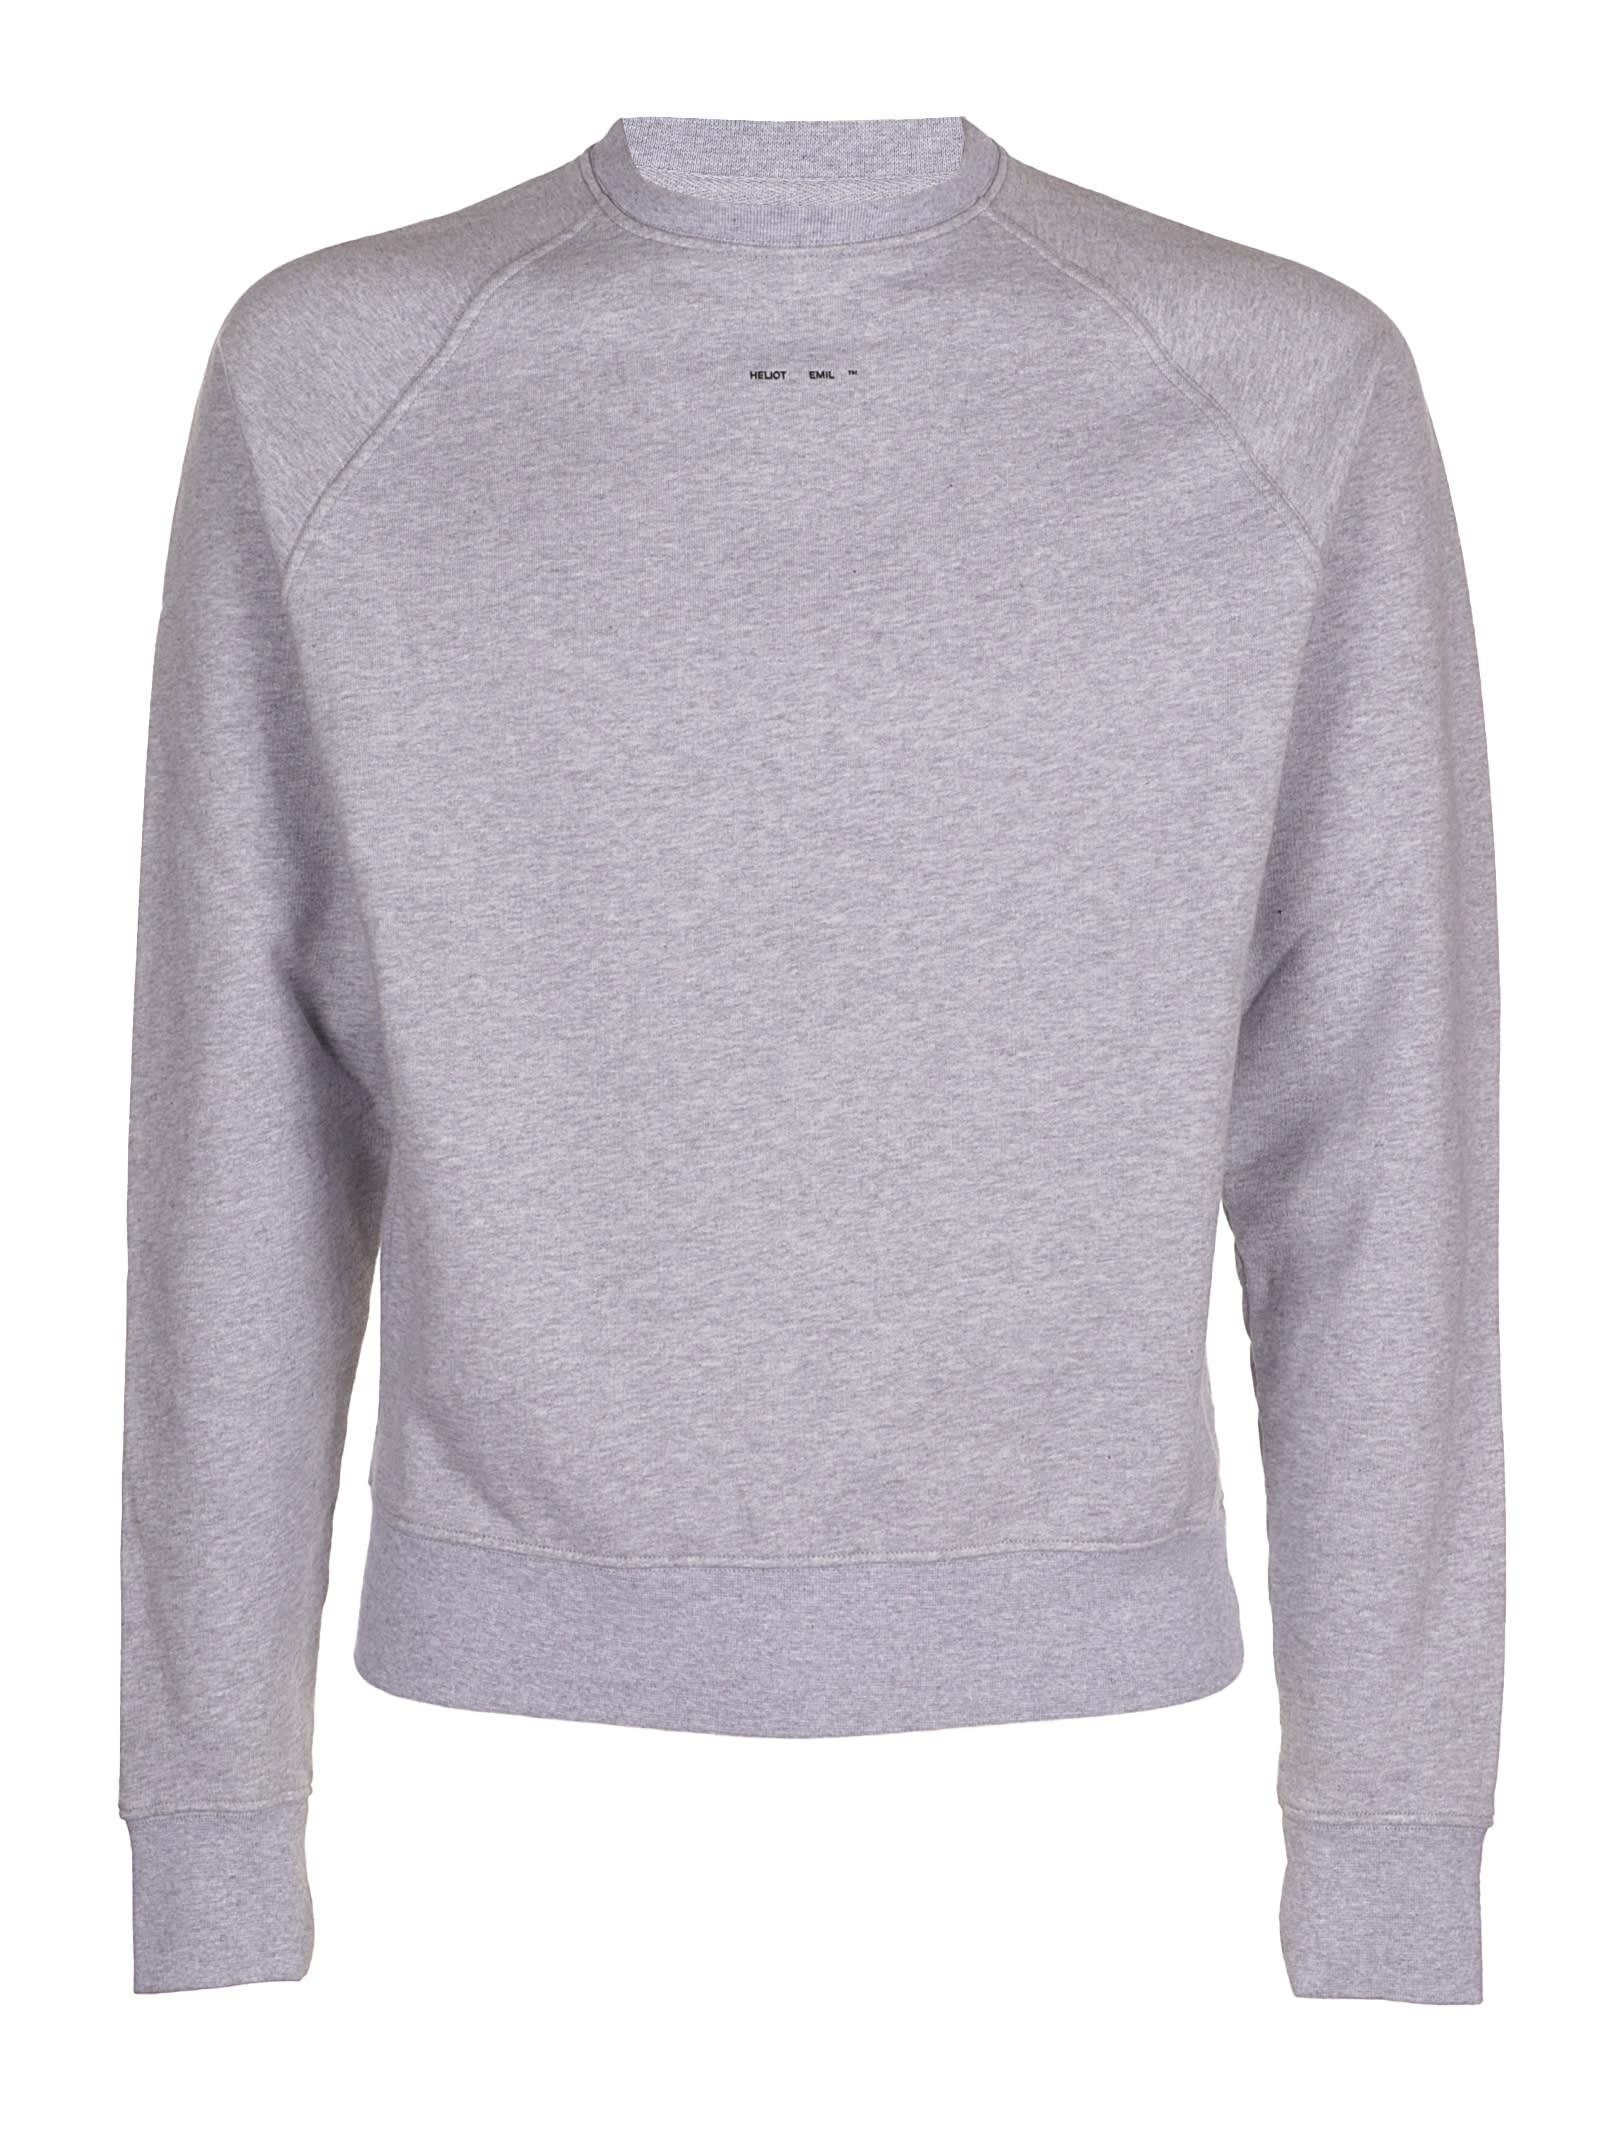 Sweater W Logo Print